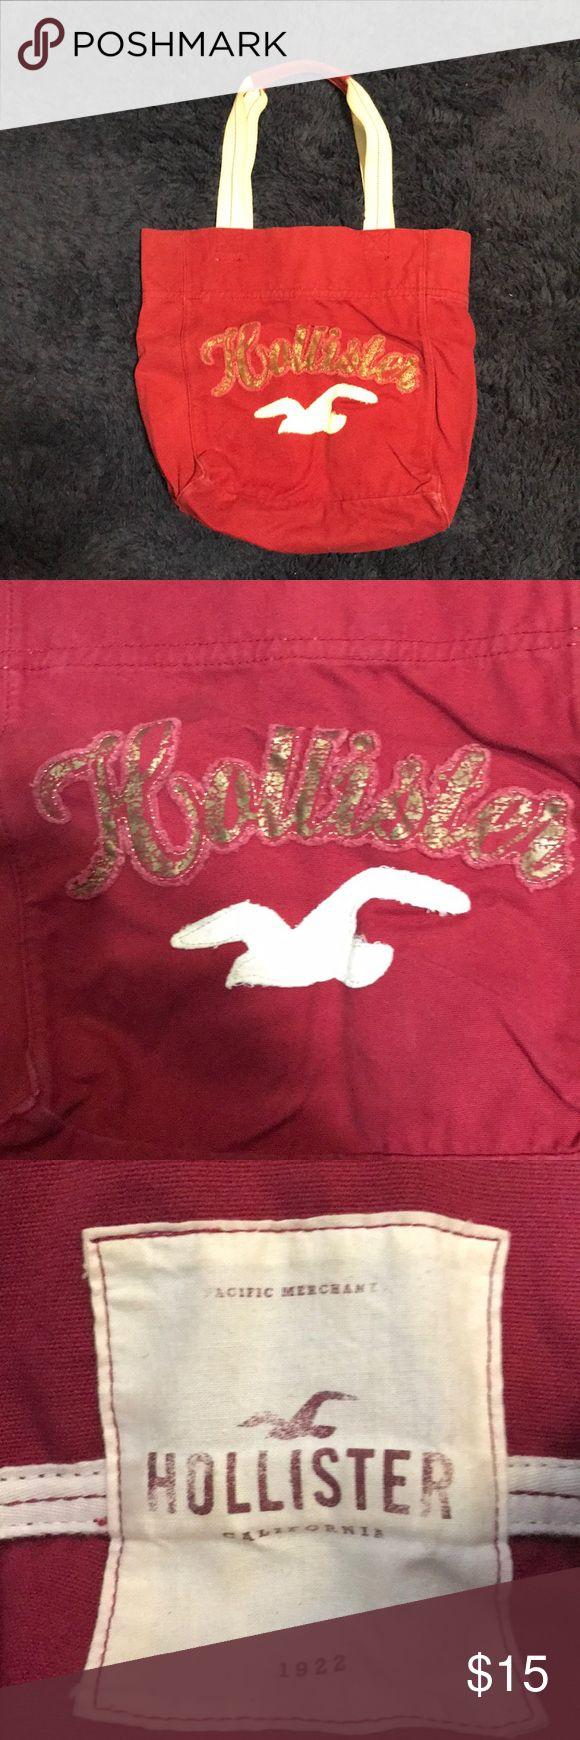 Hollister Bag hollister bag or beach bag Hollister Bags